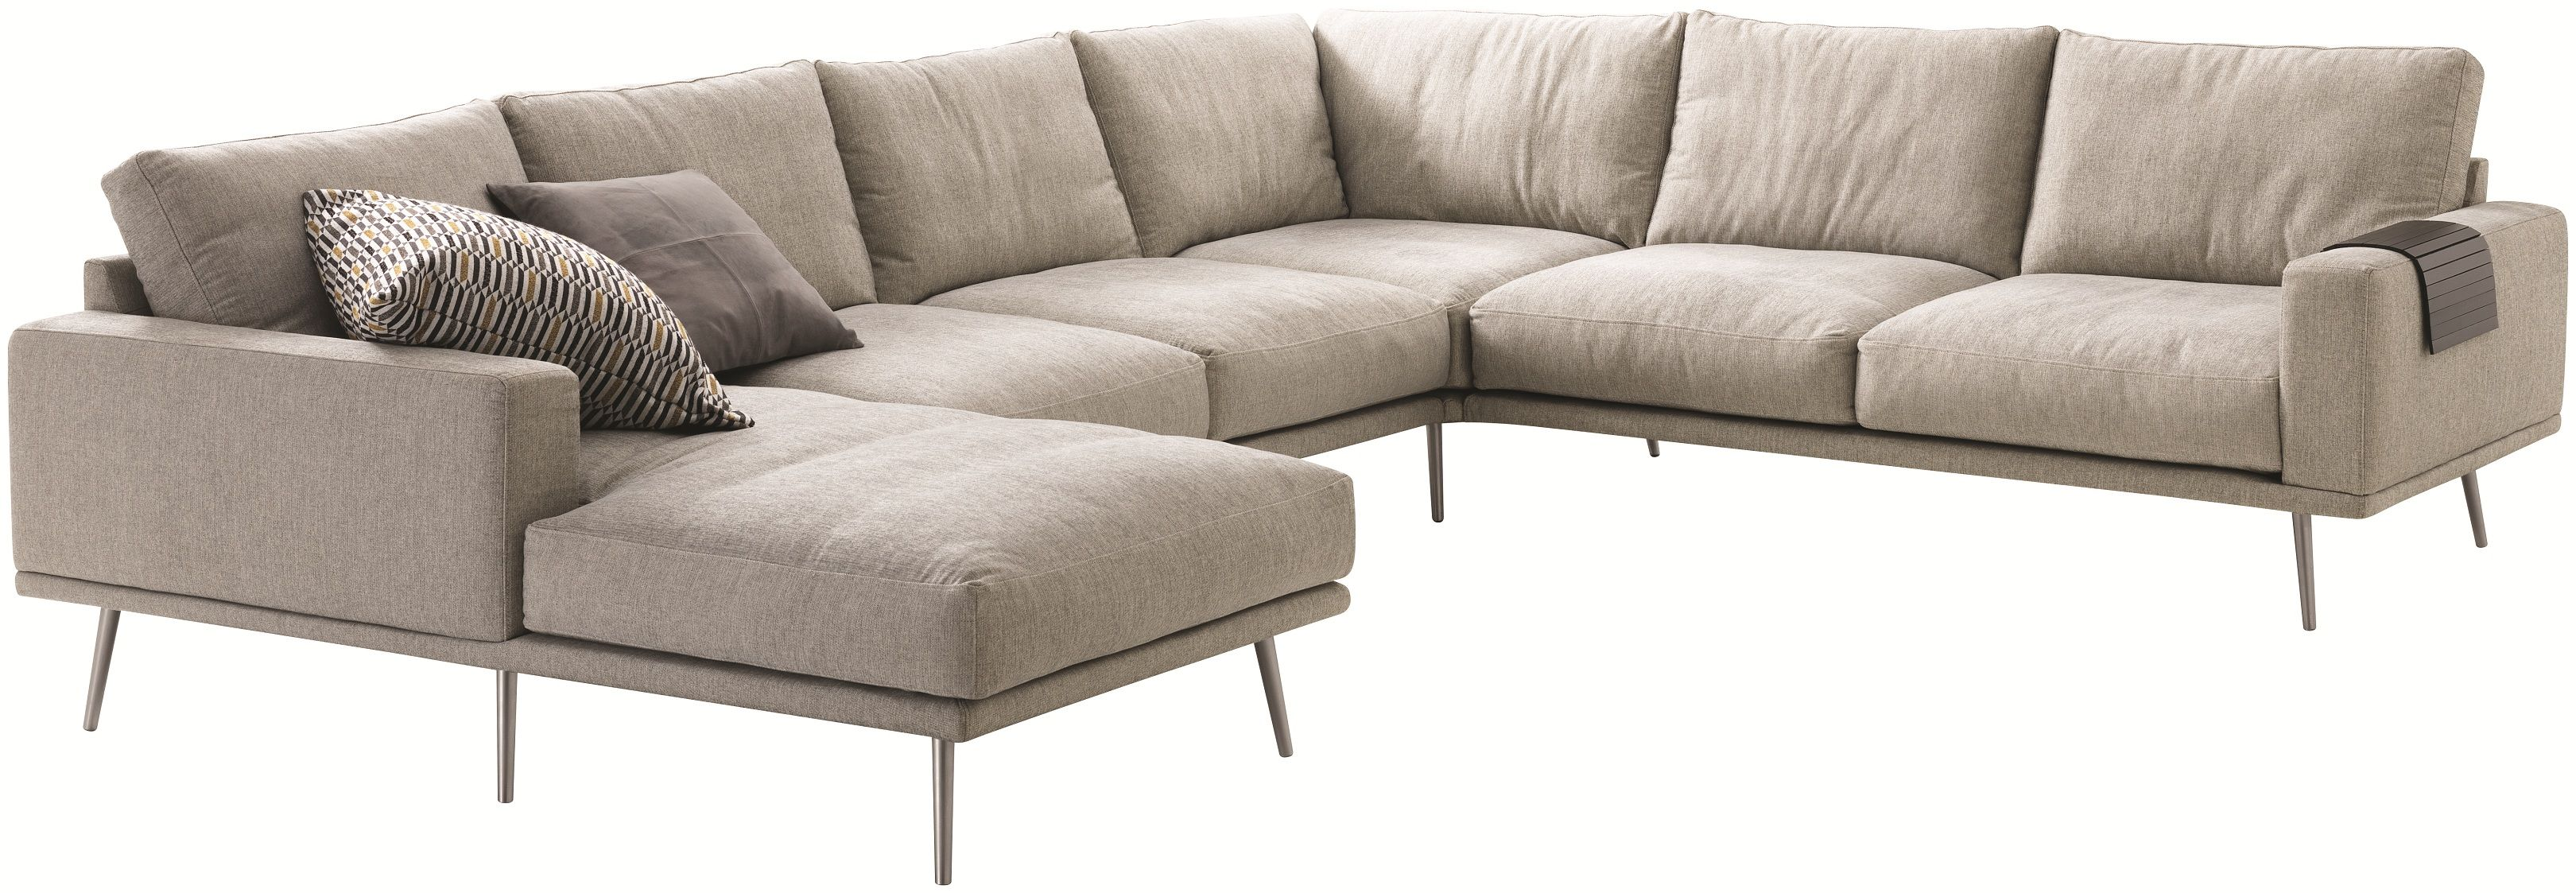 Corner sofa with resting unit Carlton Sofa